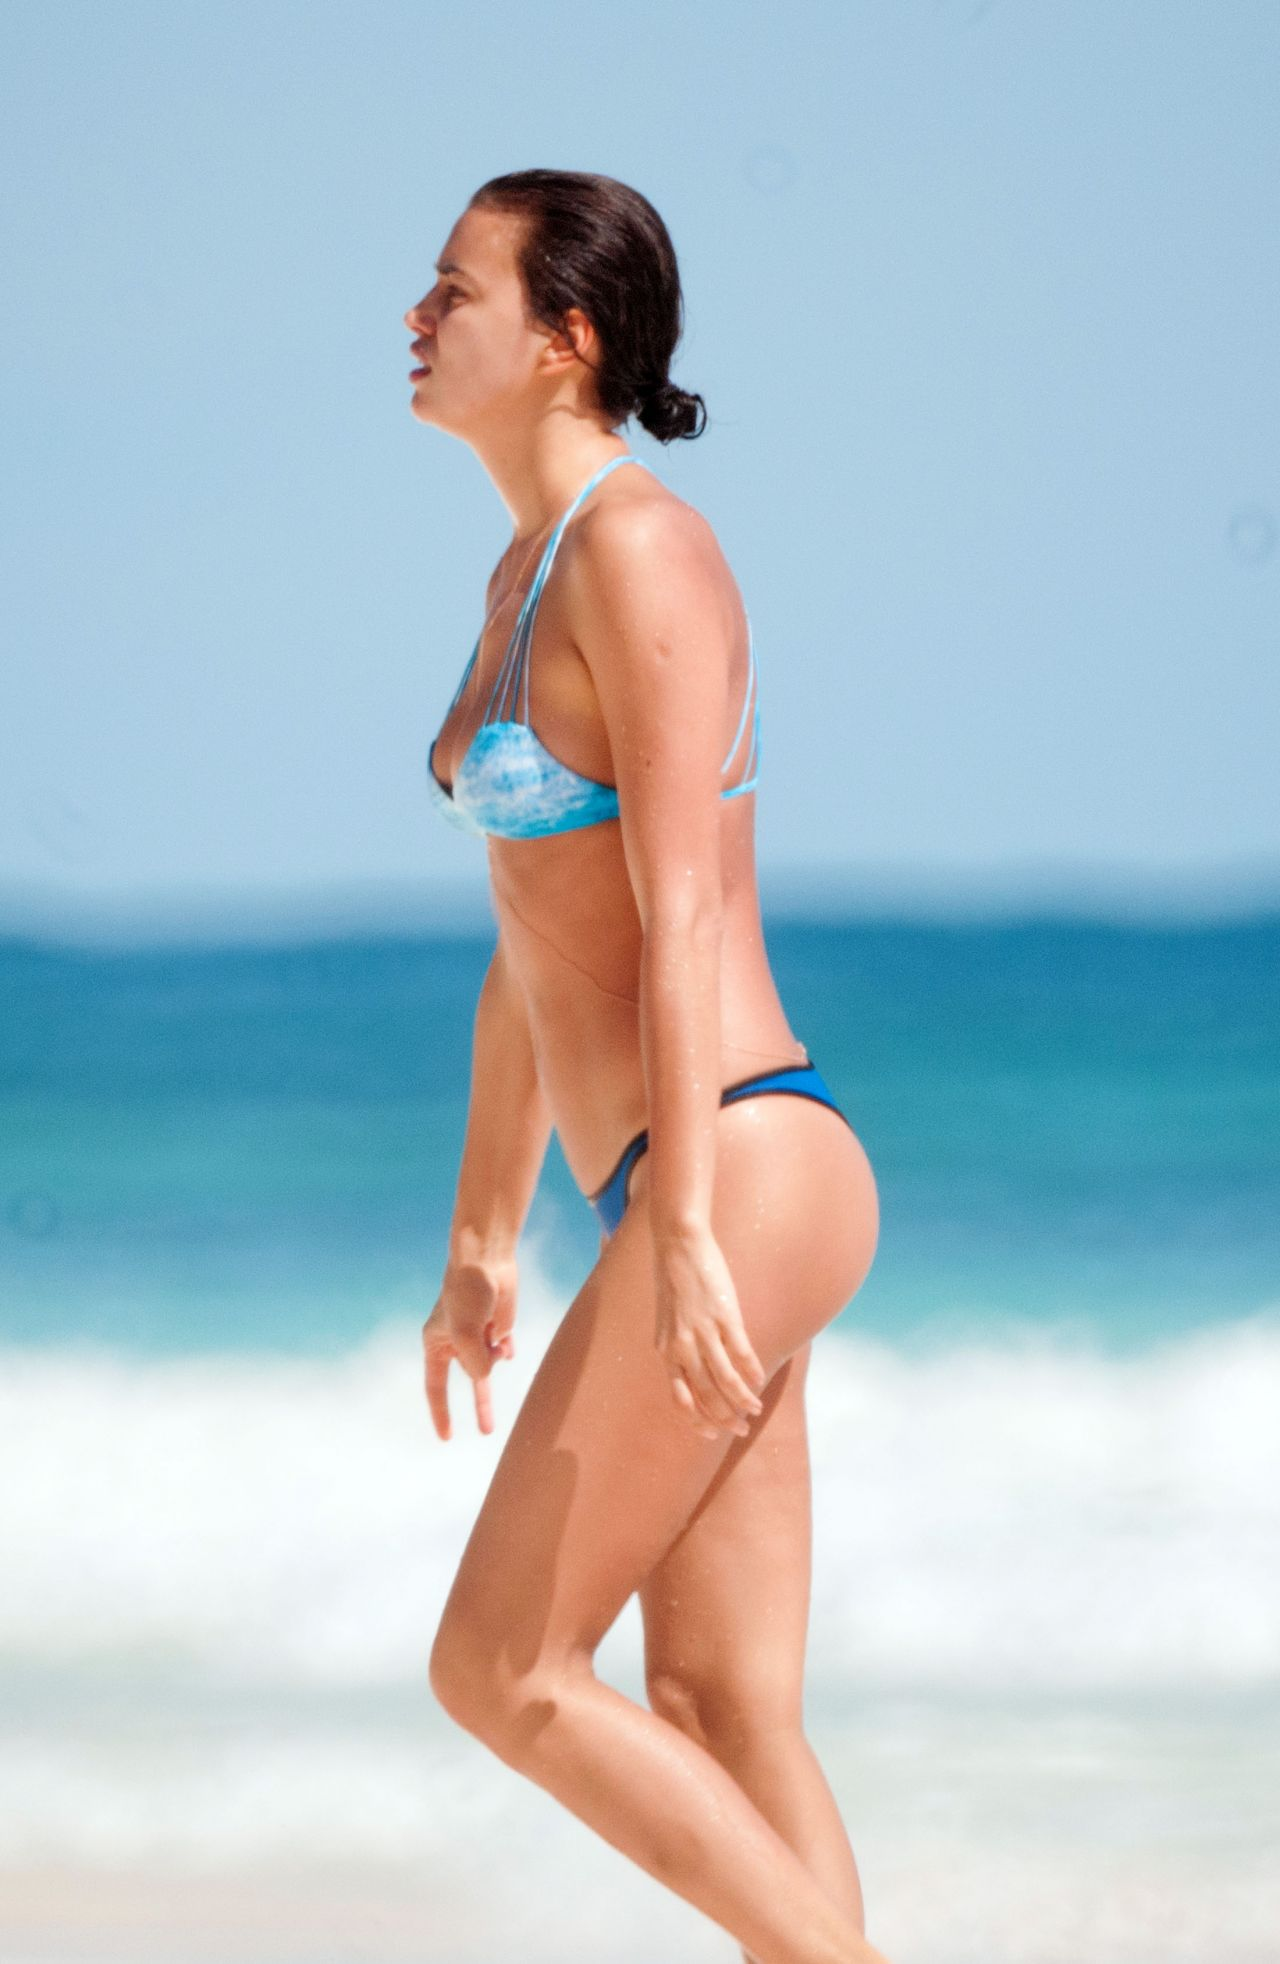 Irina Shayk Bikini Candids - Mexico, January 2014